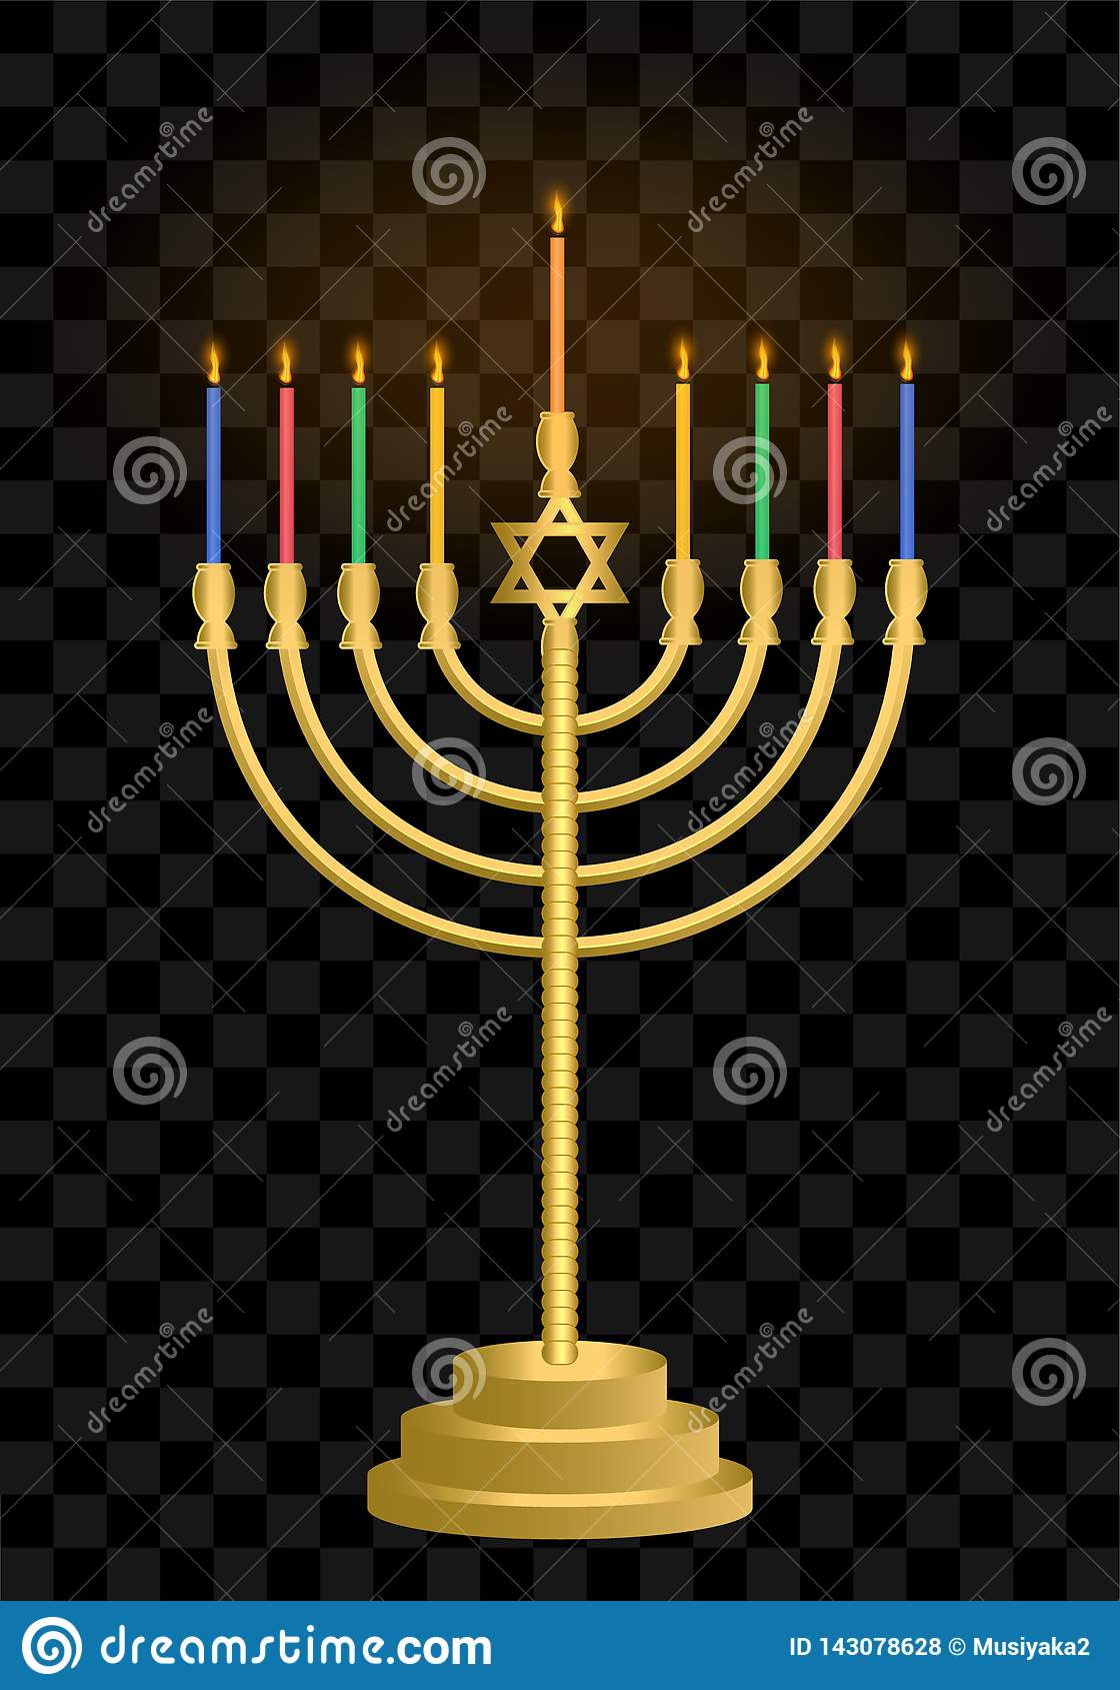 Hanukkah candlestick. Hanukkah. Jewish holiday candles. Jewish festival of light